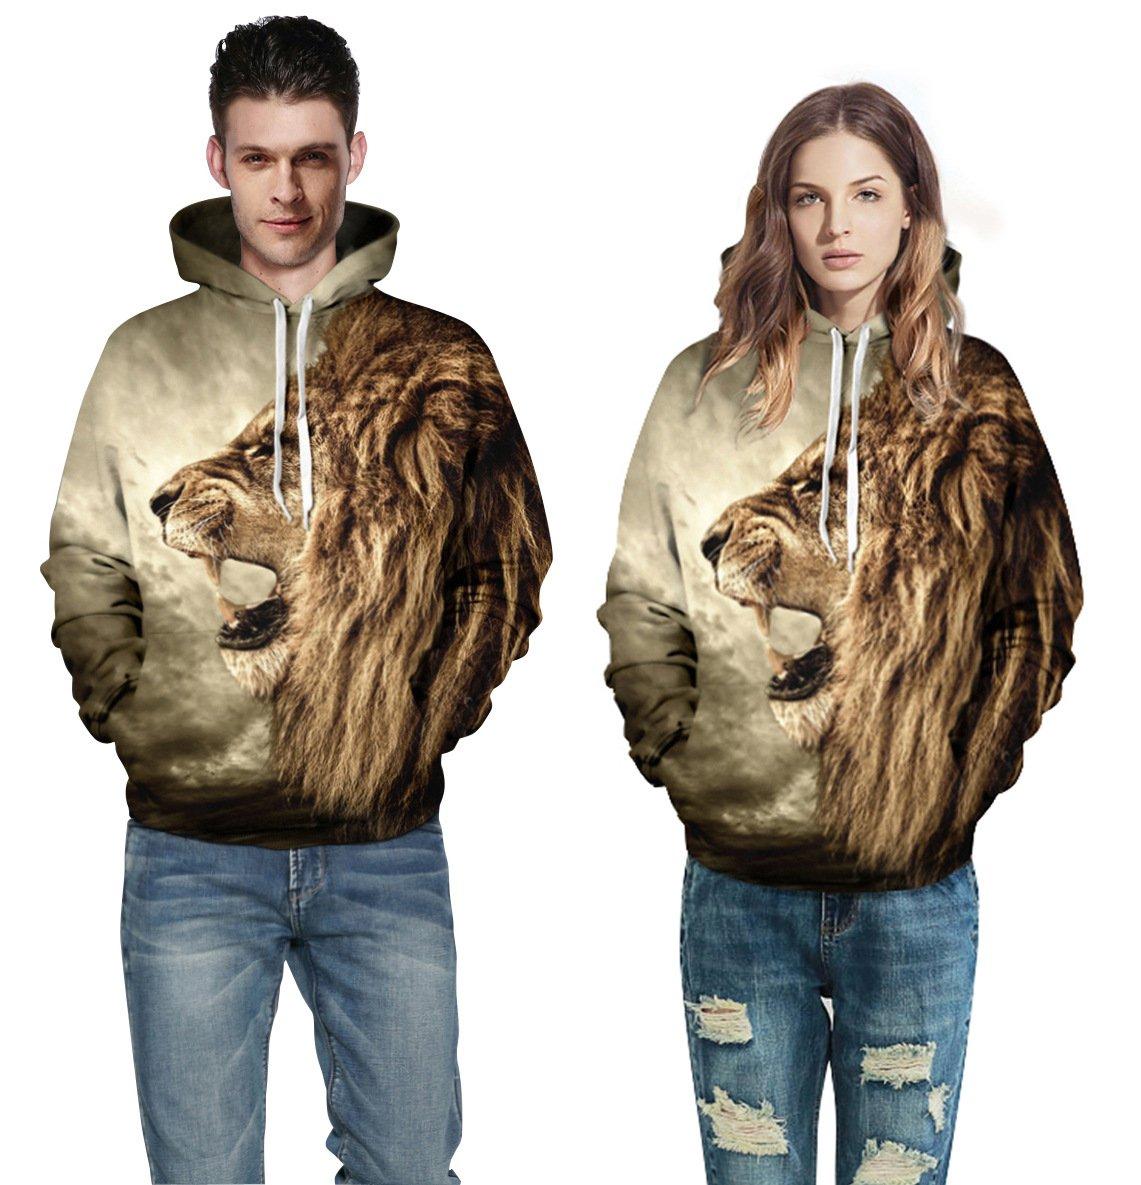 Fashion Lion Hooded Men Animal Hoodies Casual Graphic Hoodie Funny Sweat Shirt Tie-dye Sweatshirts